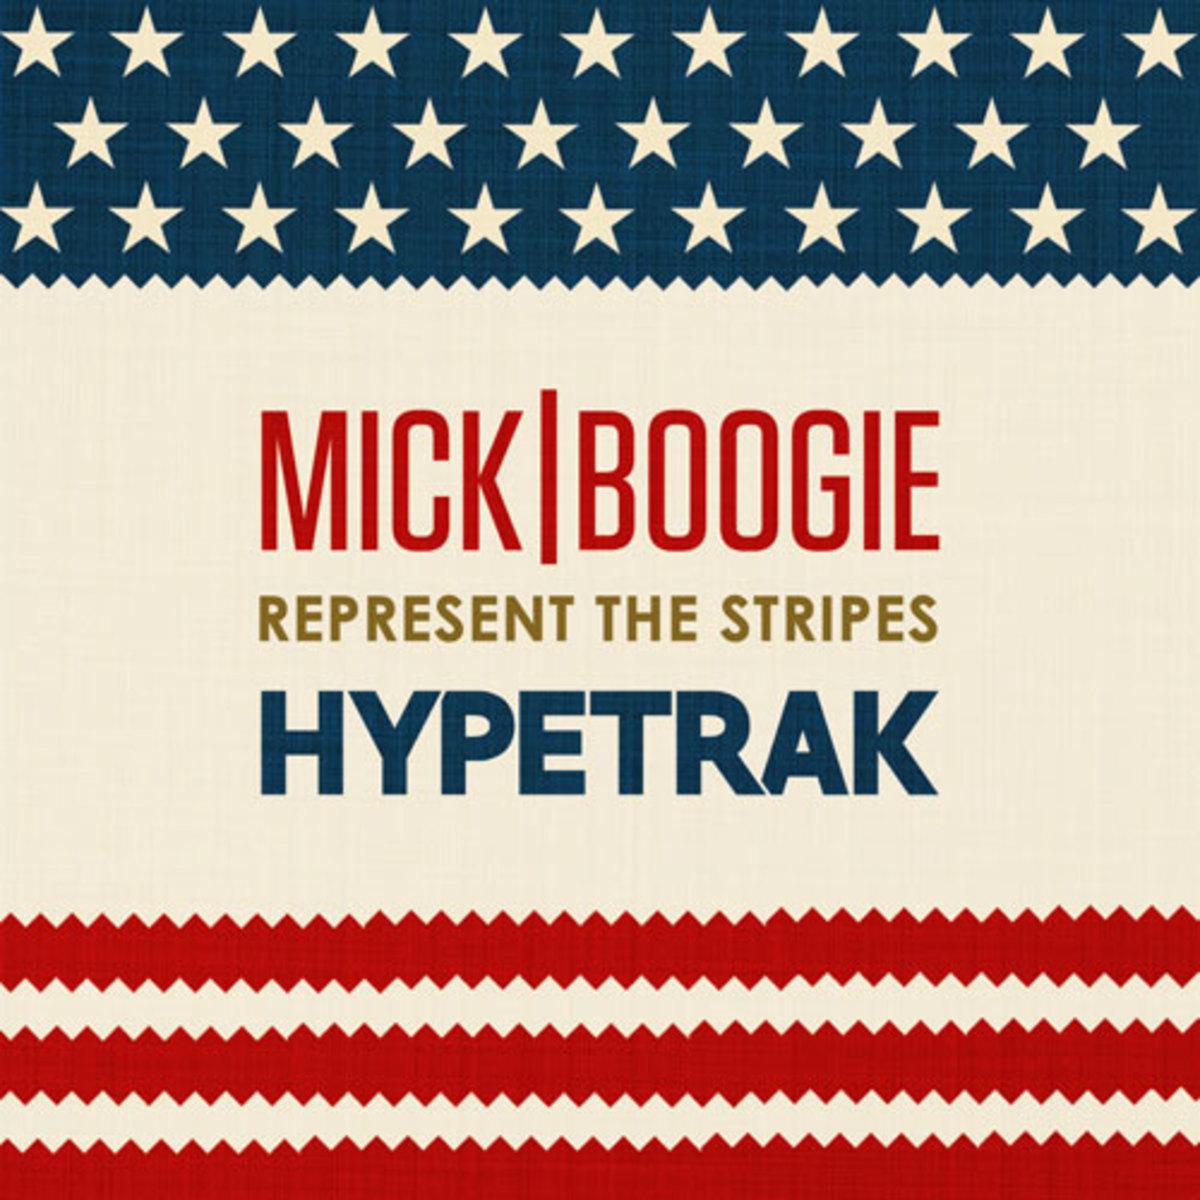 mickboogie-represent.jpg